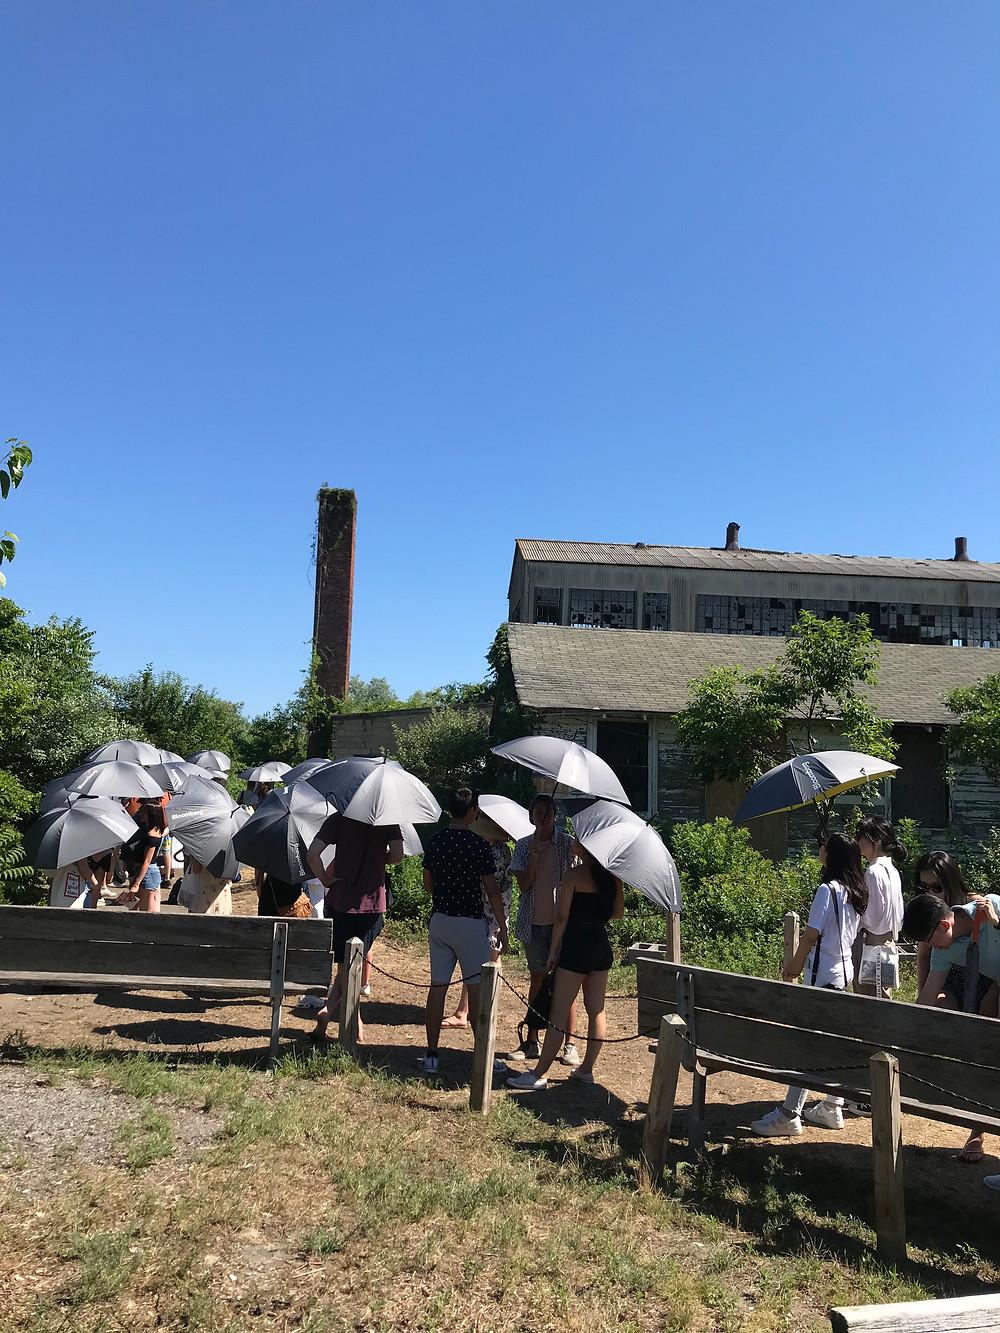 Fort Tilden, Rockaway Artists Alliance, Yayoi Kusama, Narcissus Garden, Curious G and Me